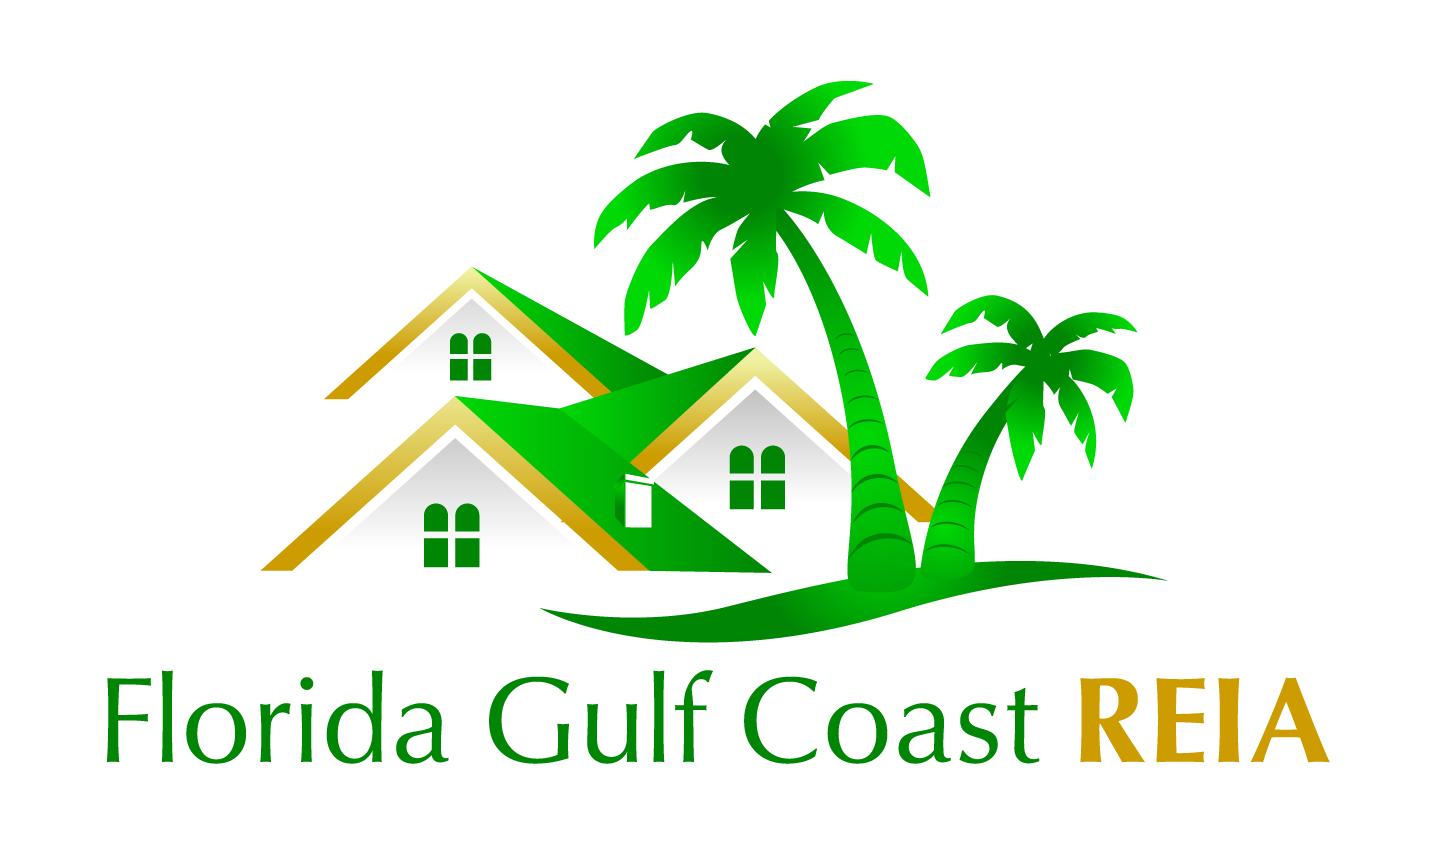 Florida Gulf Coast Real Estate Investor Association